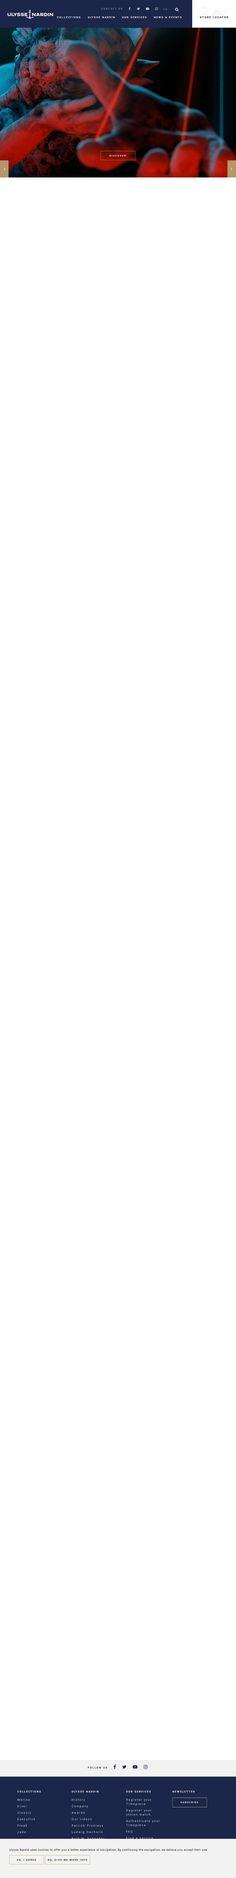 Ulysse Nardin Watch Shop The Dubai Mall, 3, Mohammed Bin Rashid Boulevard G Floor Downtown Dubai, Za'abeel,  Dubai | www.HaiUAE.com is a complete Travel Guide to Dubai, Ajman, Alain, Abu Dhabi, Fujairah, Sharjah, Ras al khaimah, Umm Al Quwain, United Arab Emirates, GCC Countries. Explore more about Advertising Agencies, Accountants and Auditors, Building Materials, Business Services, Car Dealers